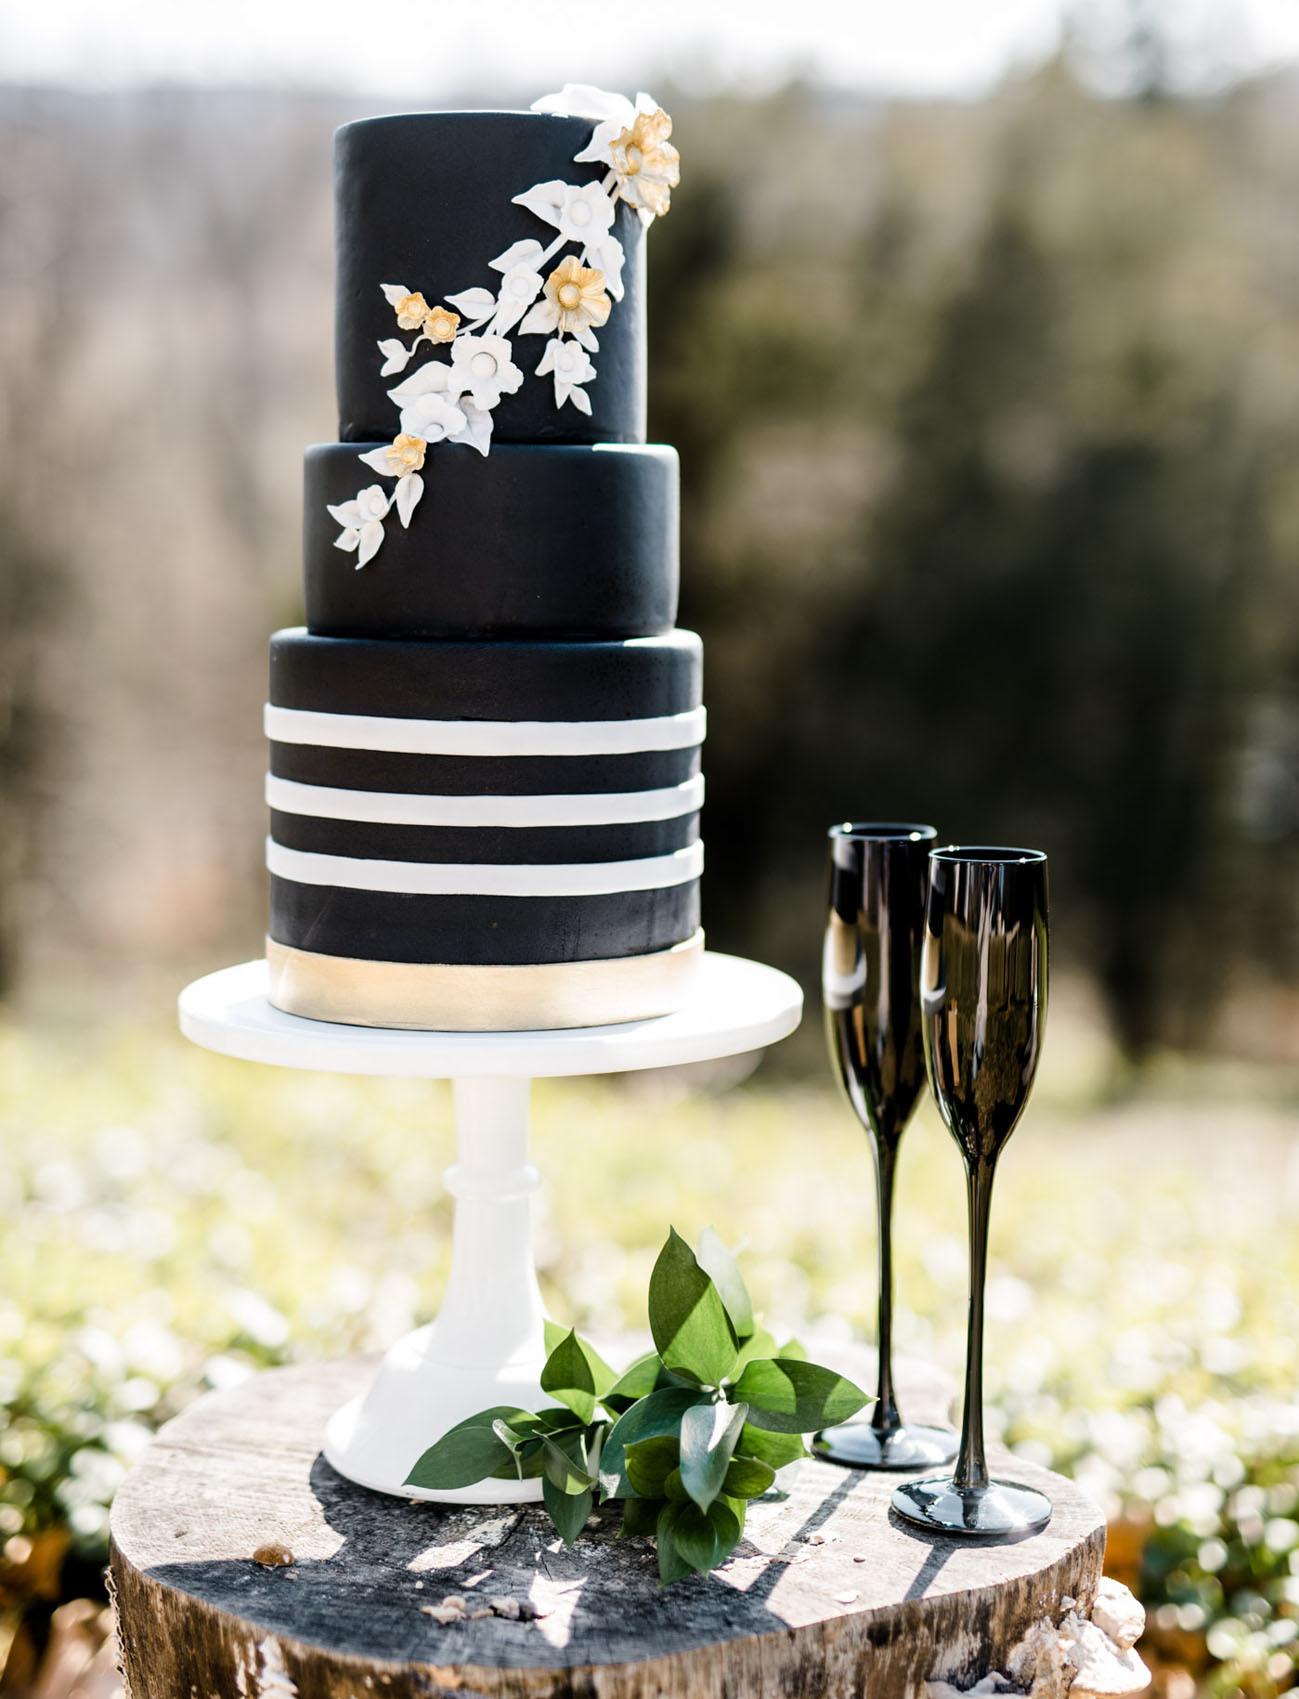 All Black Cake